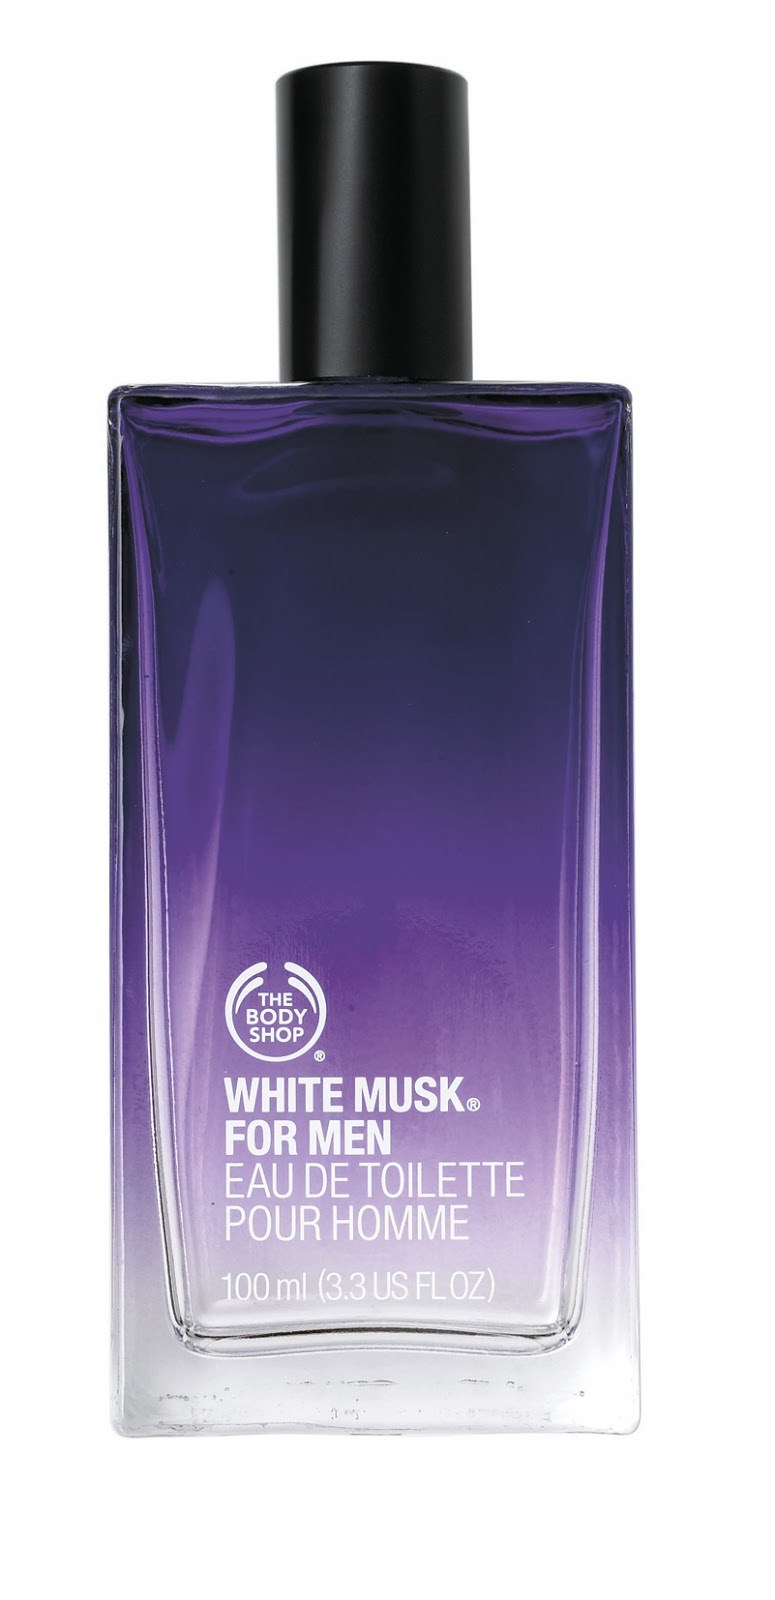 WHITE MUSK FOR MEN THE BODY SHOP